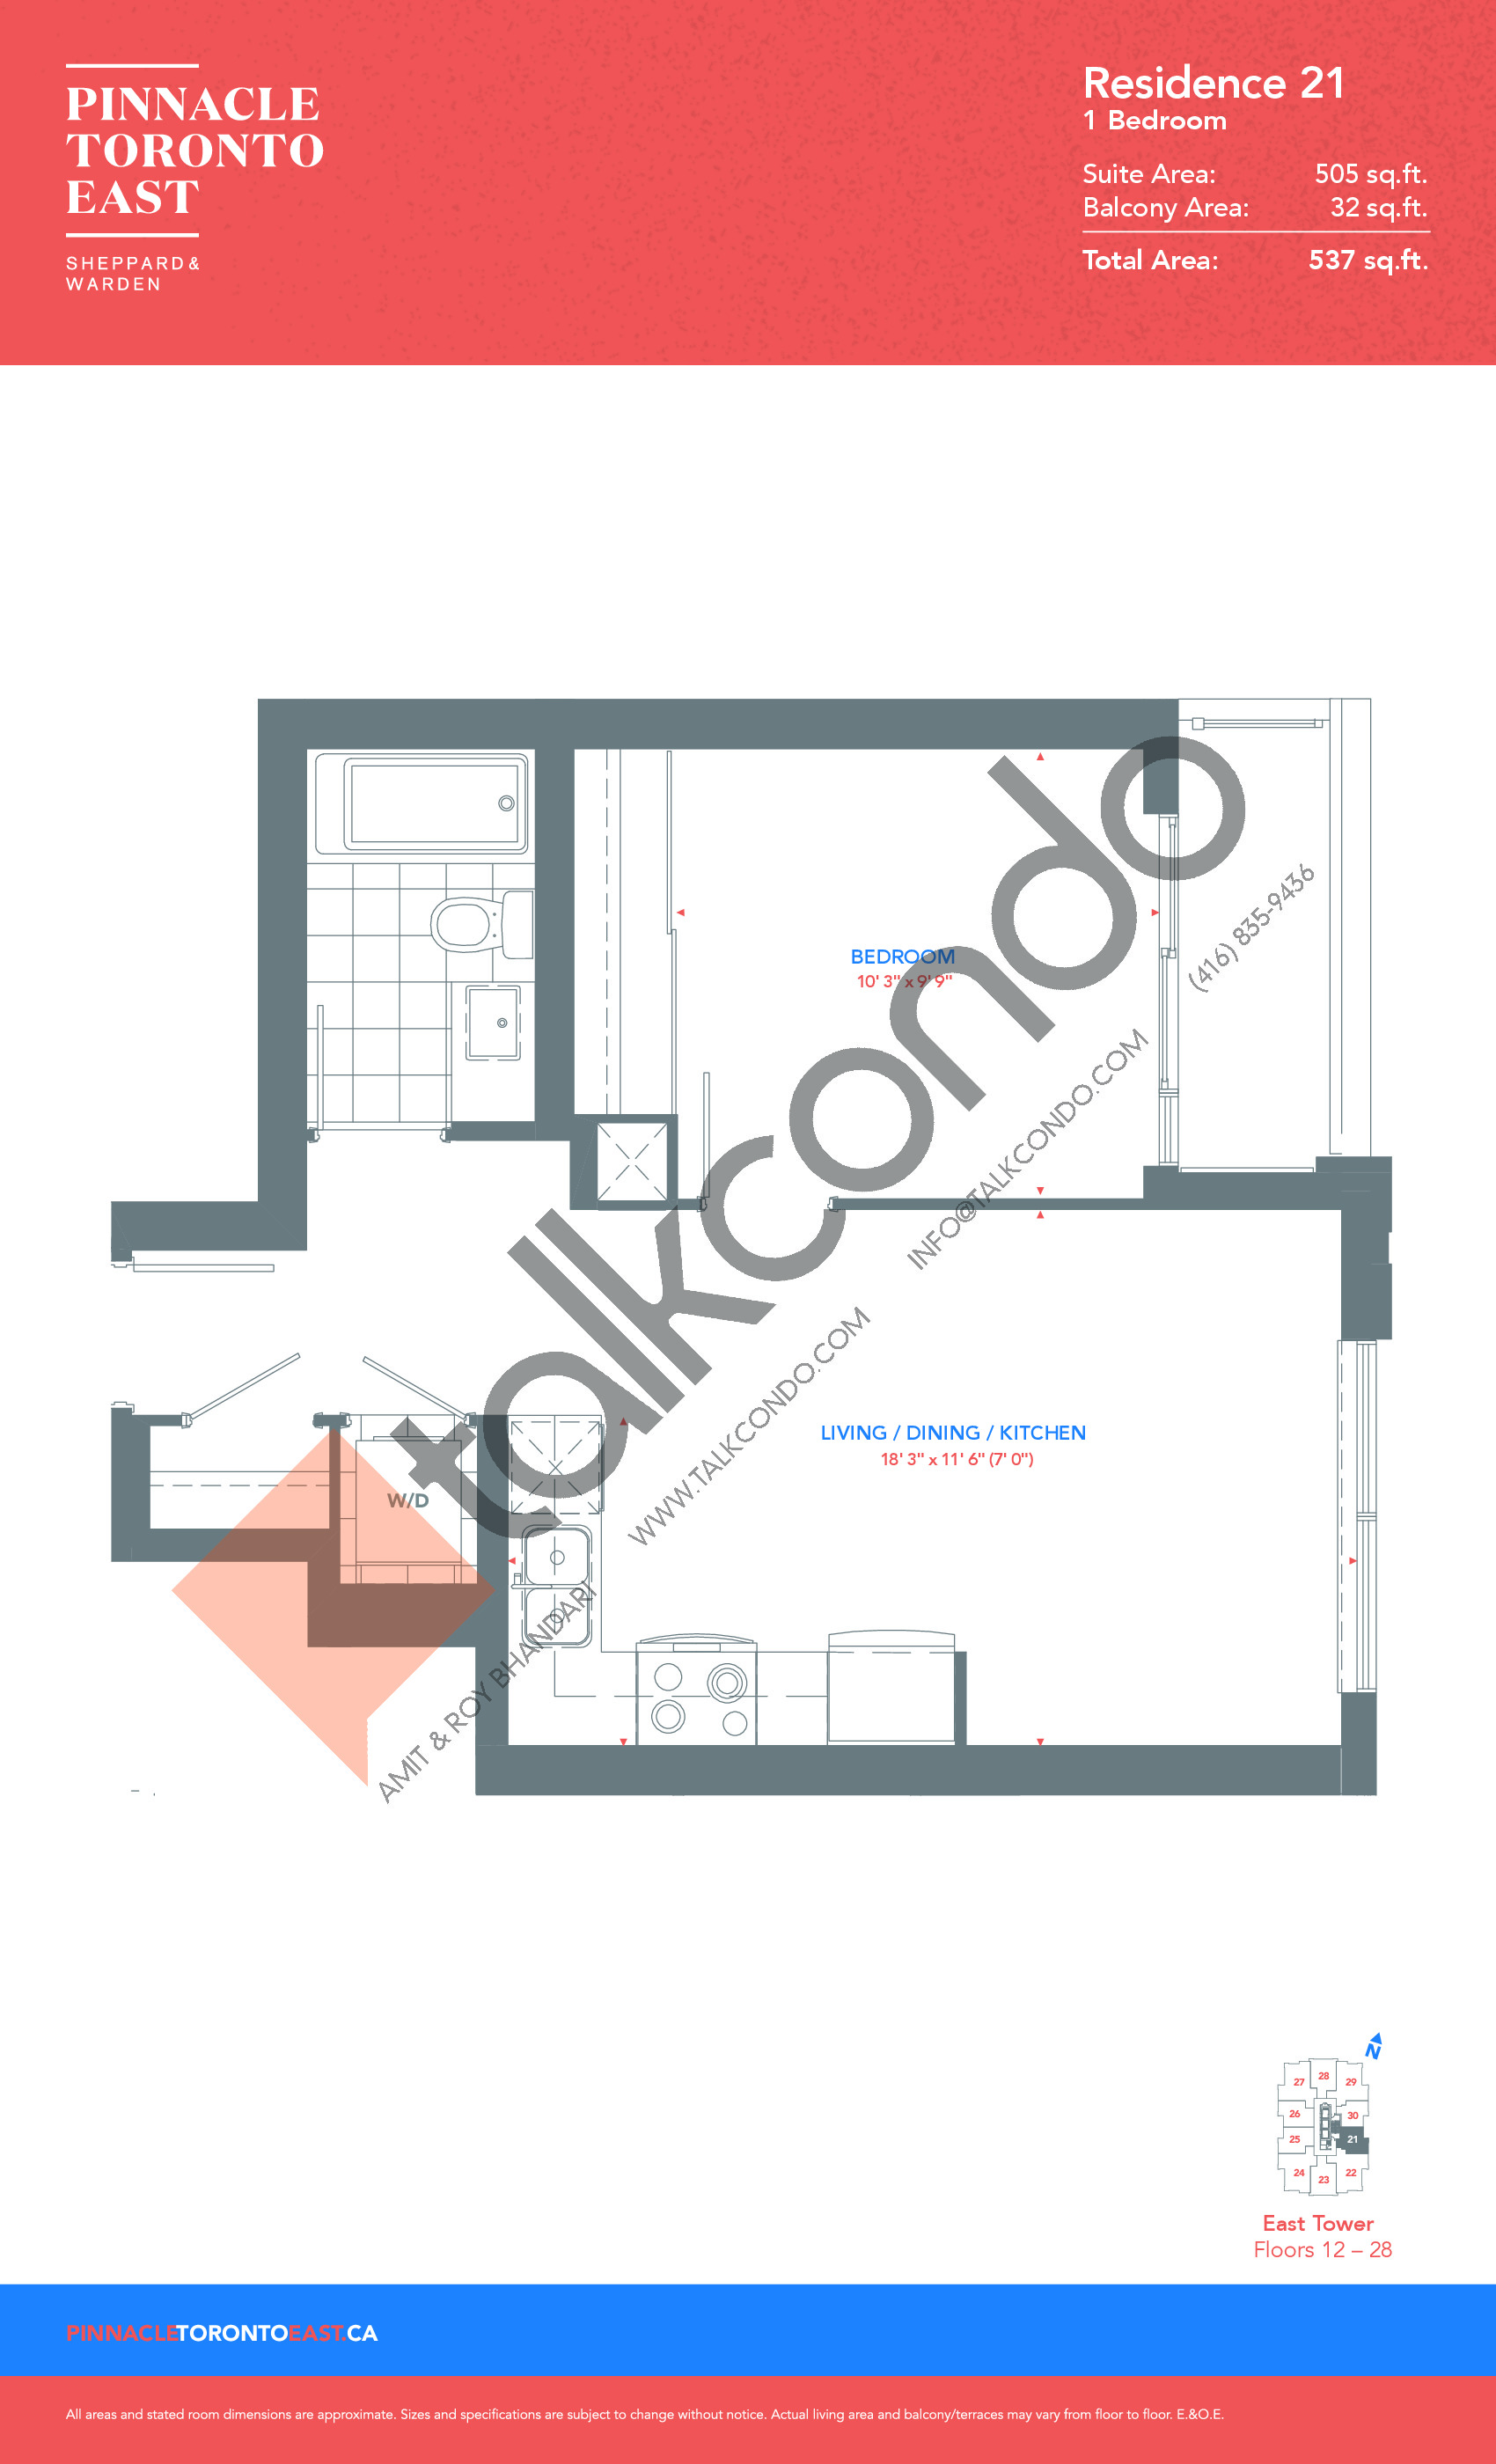 Residence 21 - East Tower Floor Plan at Pinnacle Toronto East Condos - 505 sq.ft